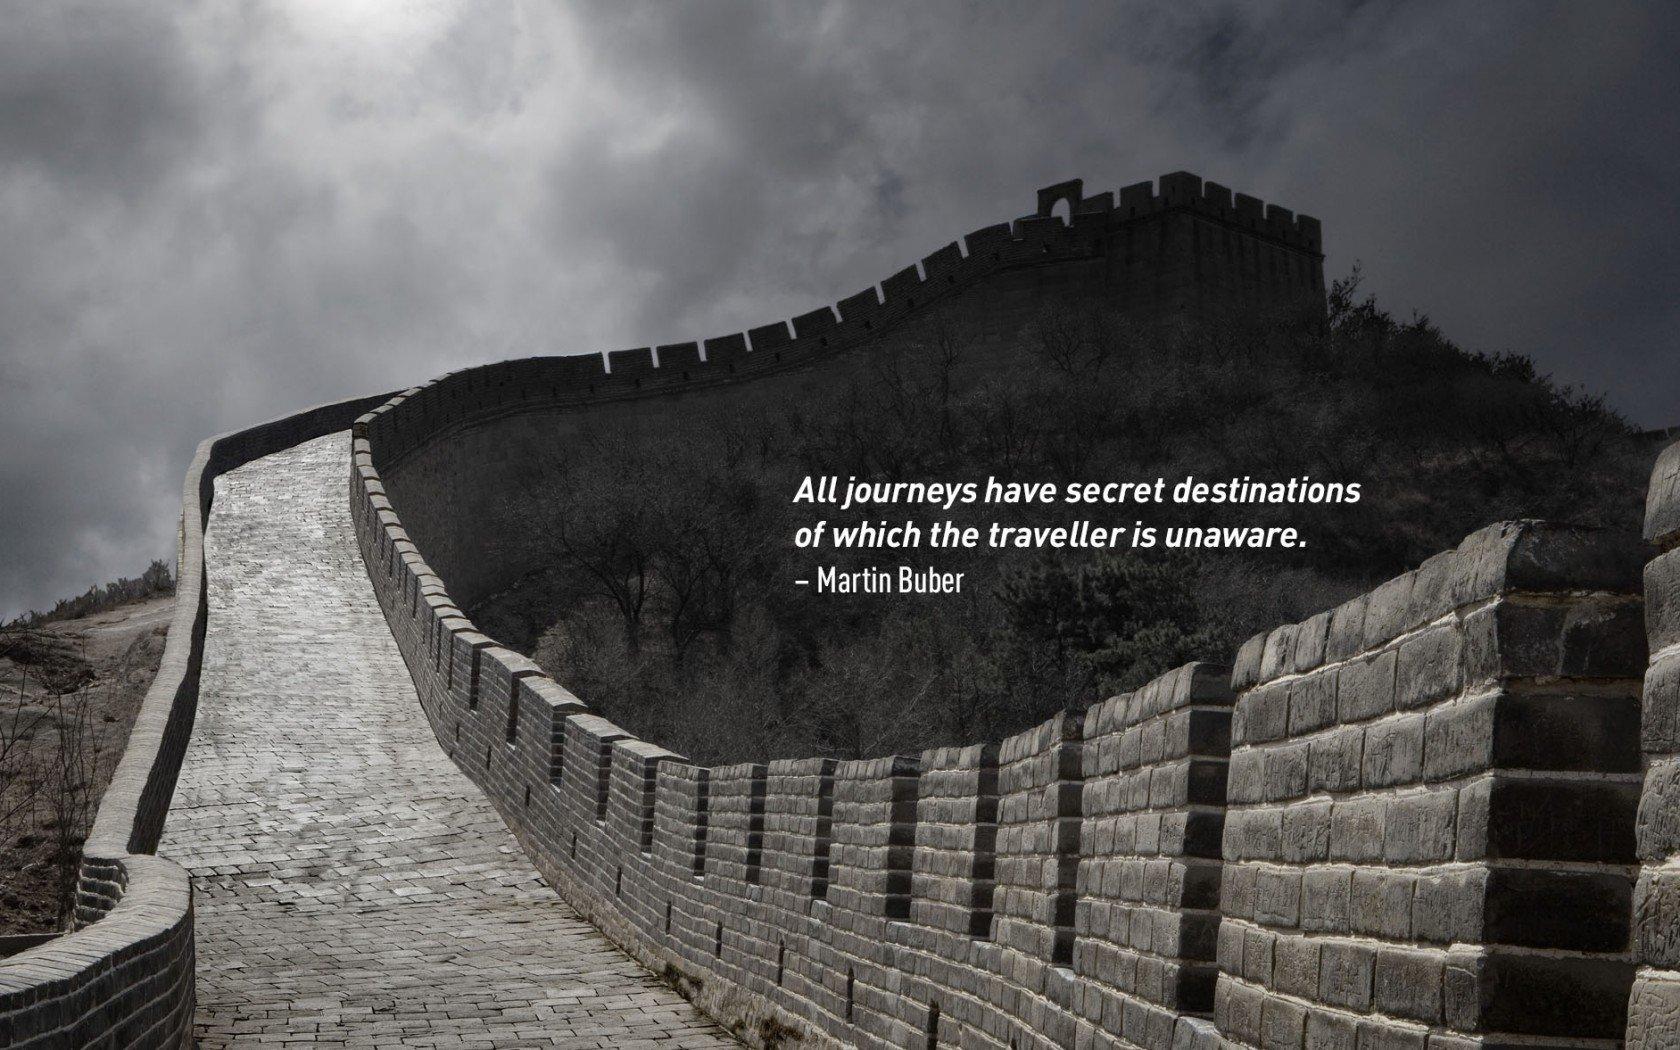 Citation de voyage de Martin Buber. La grande muraille de Chine.